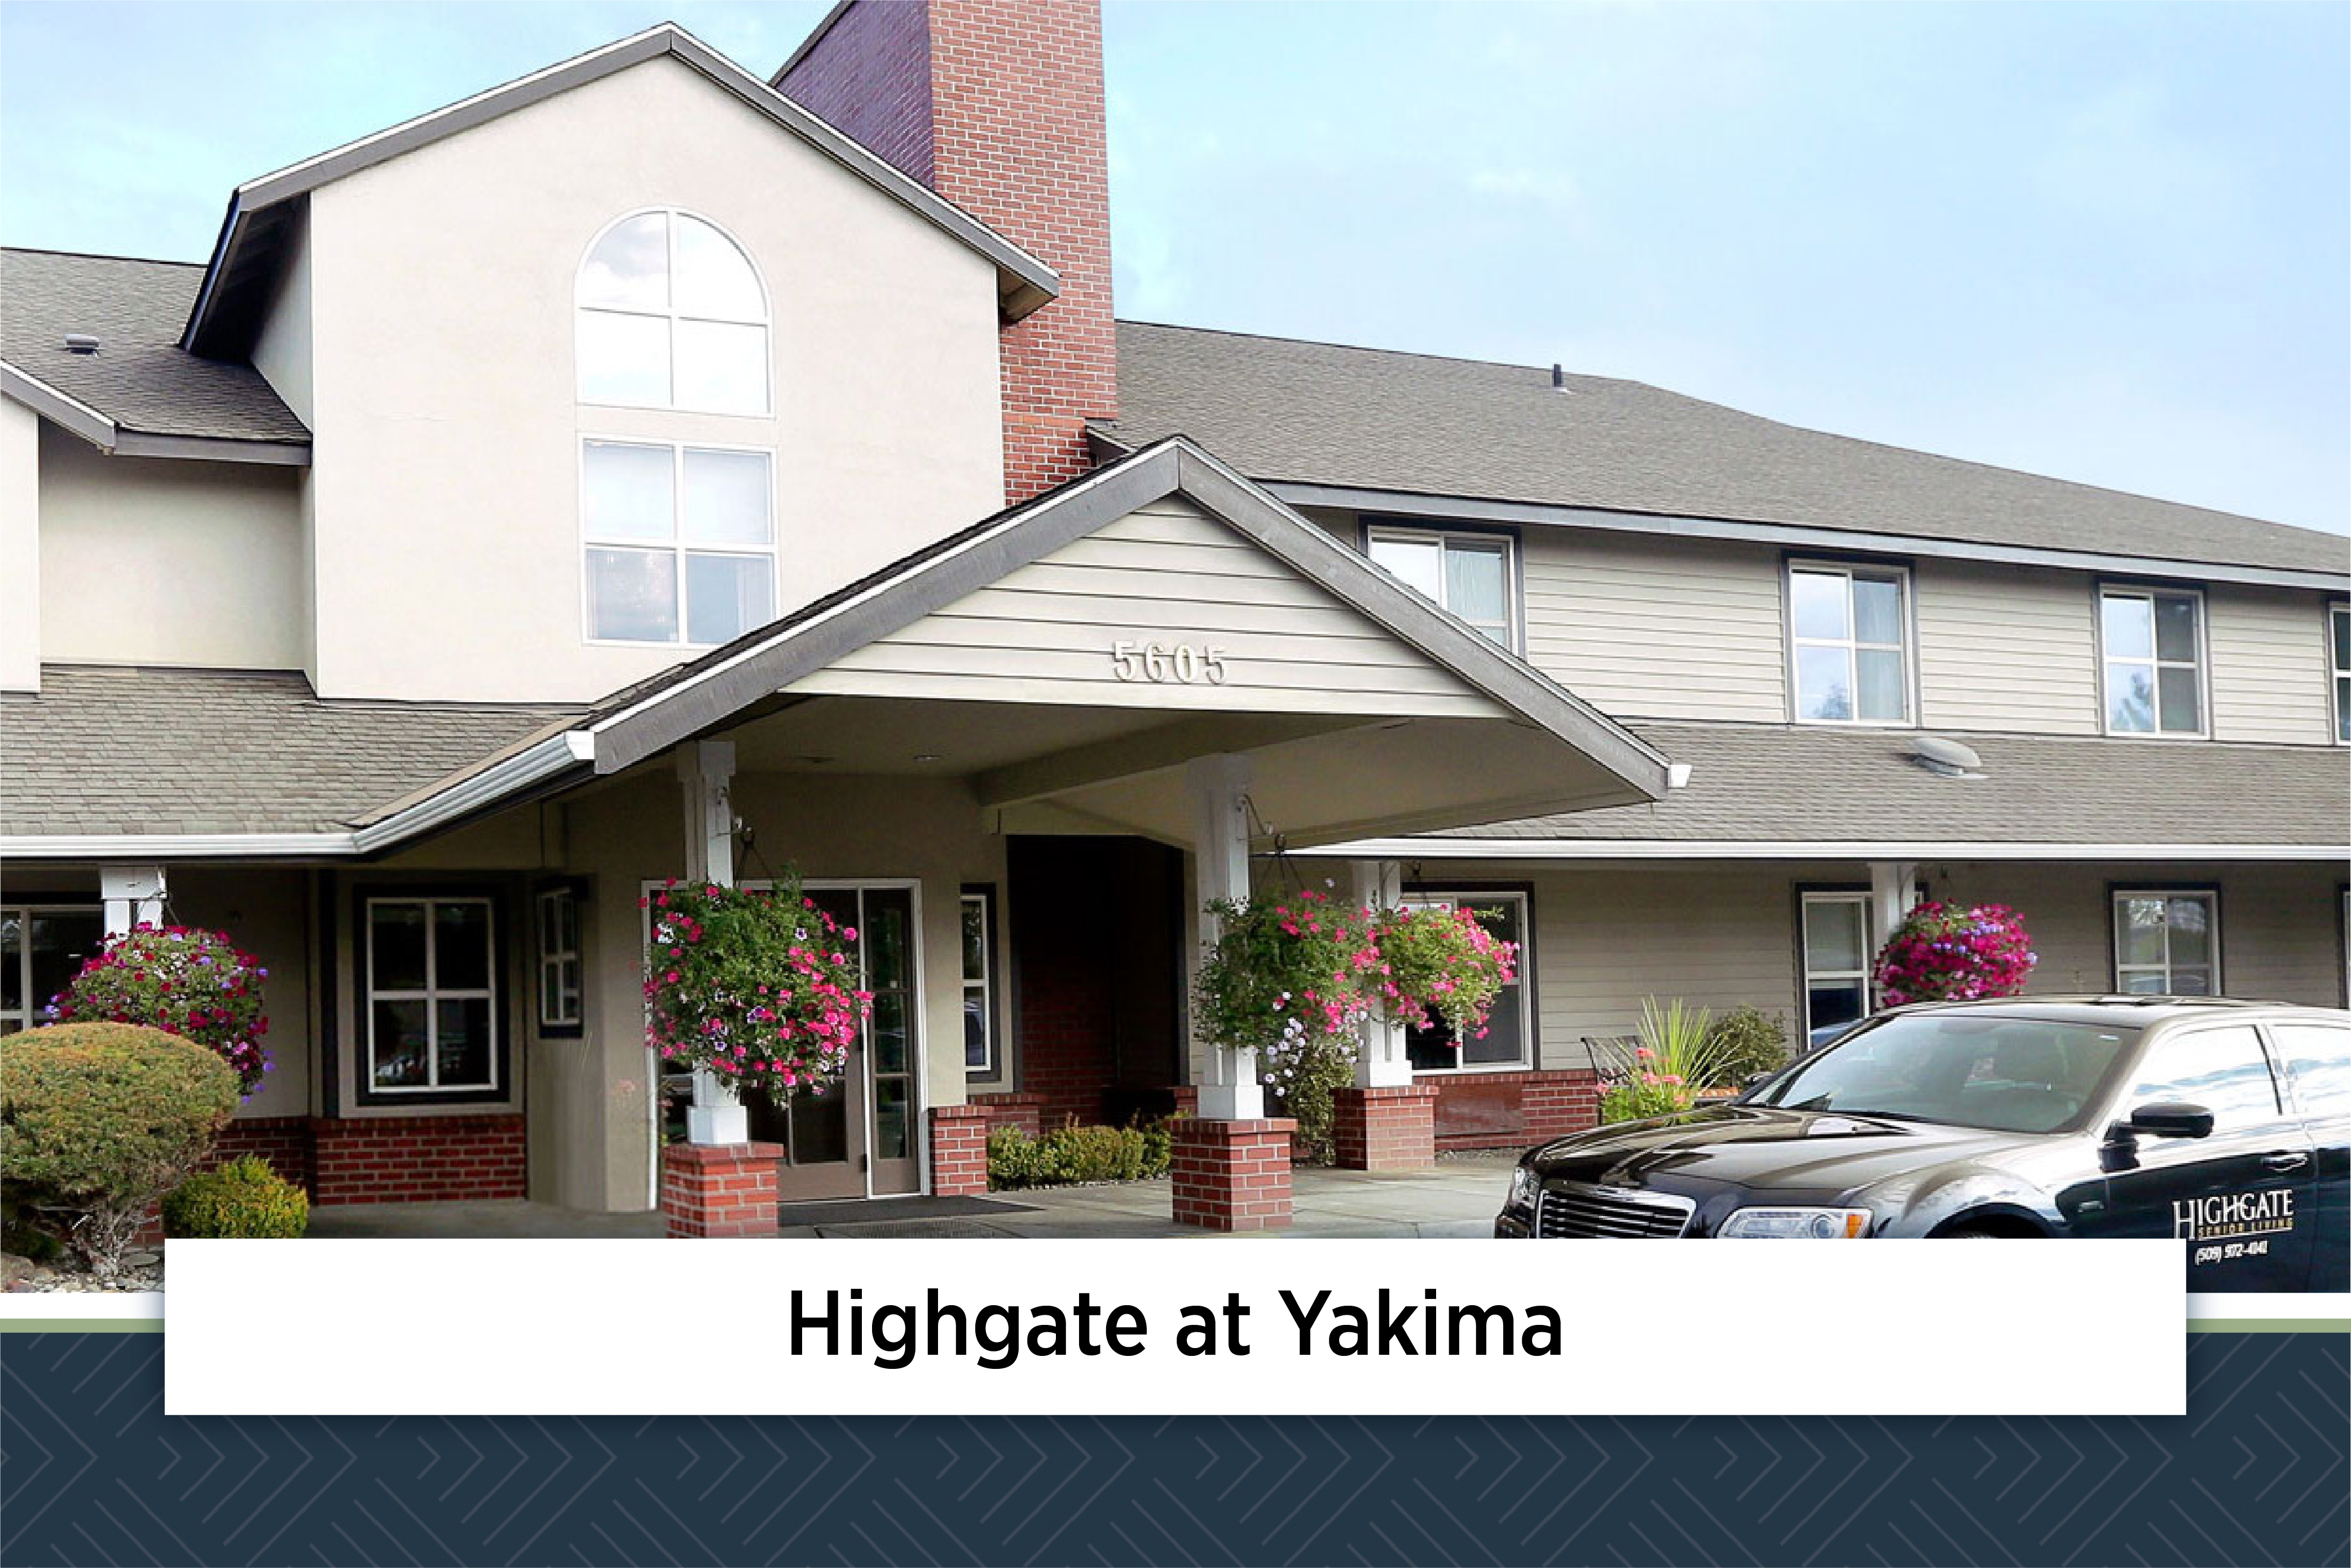 Highgate at Yakima